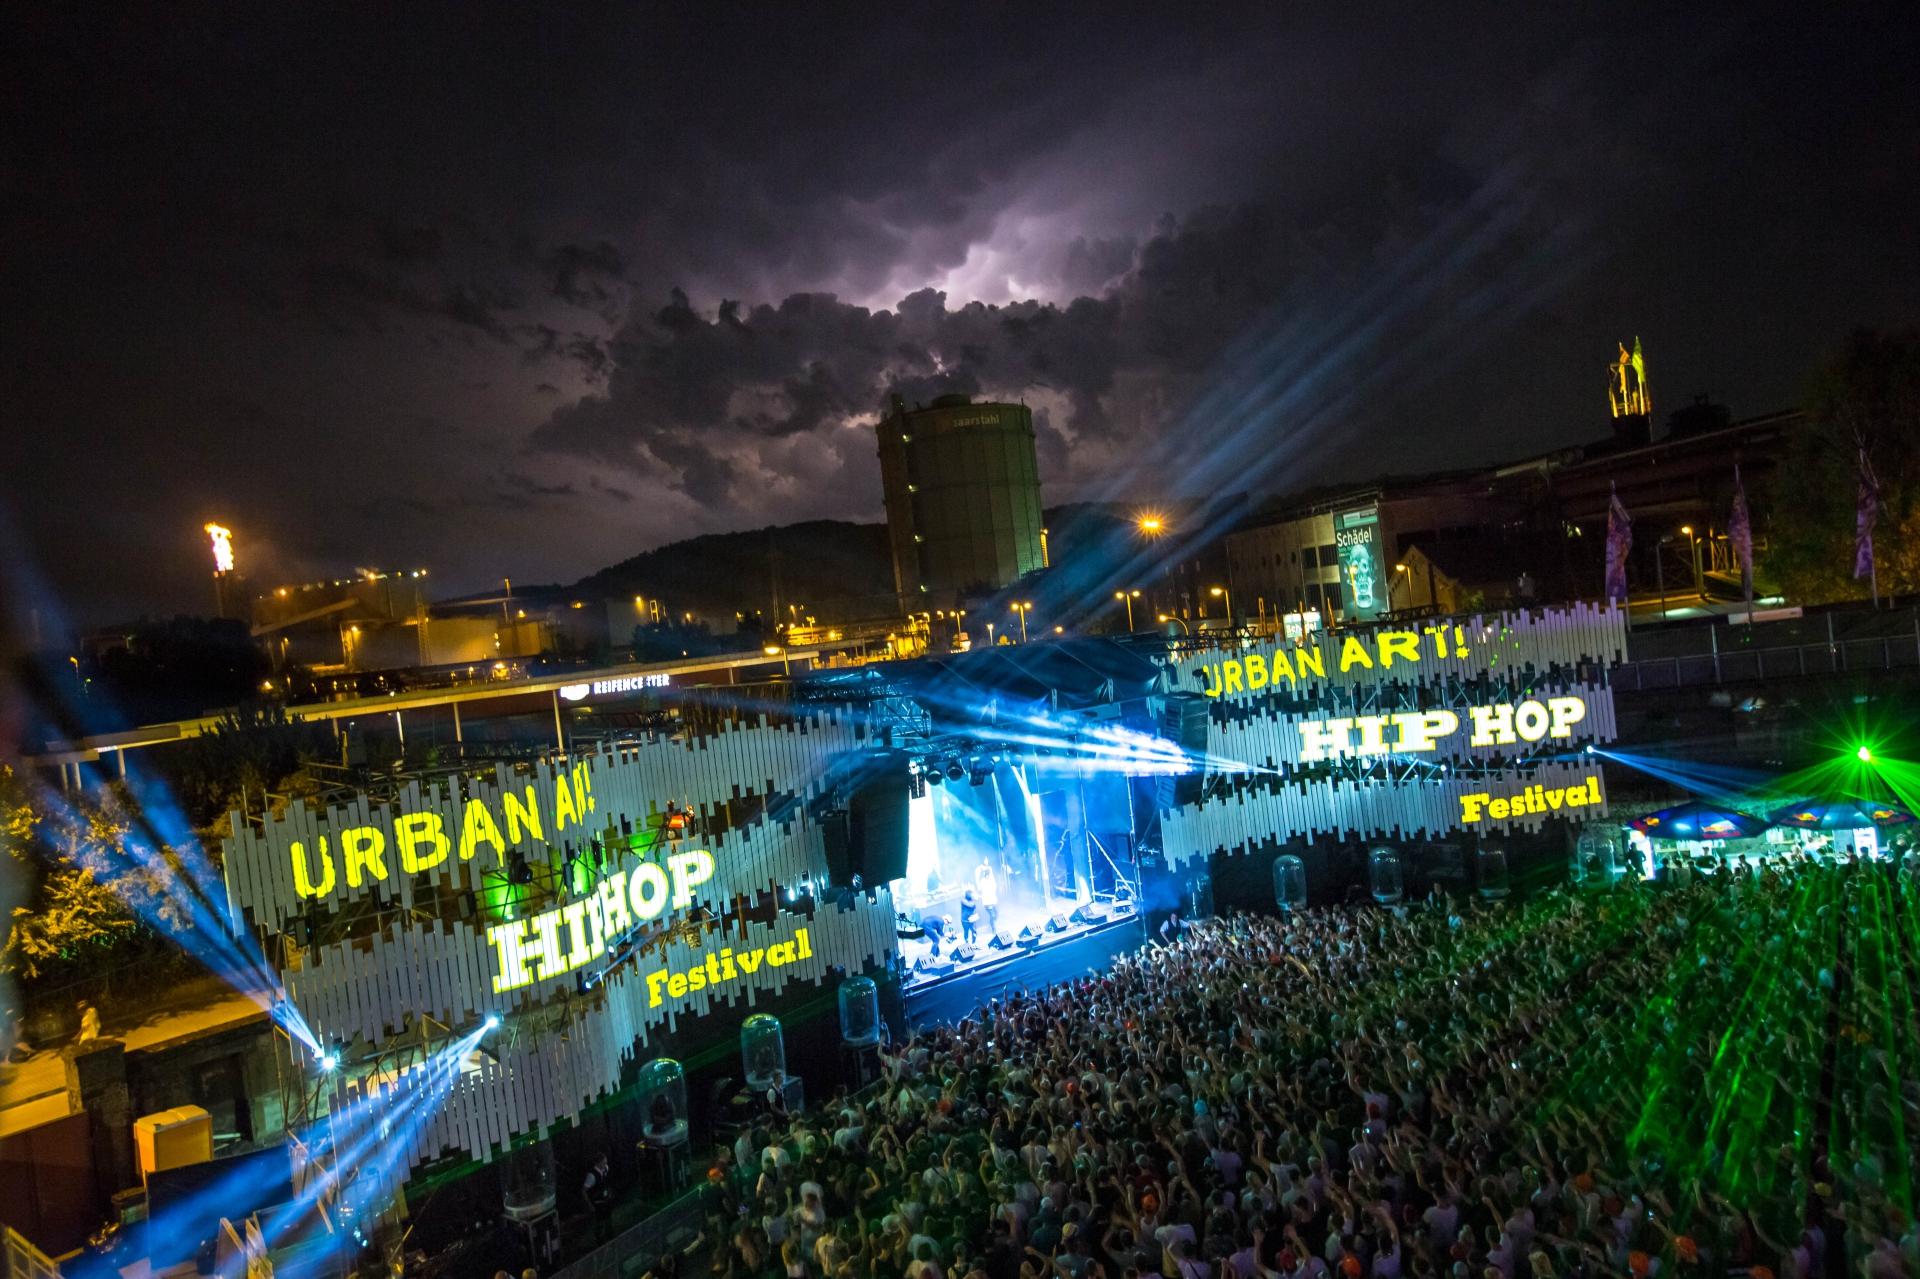 Festivalkultur - Electro Magnetic, Rocco del Schlacko und Urban Art Hiphop Festival